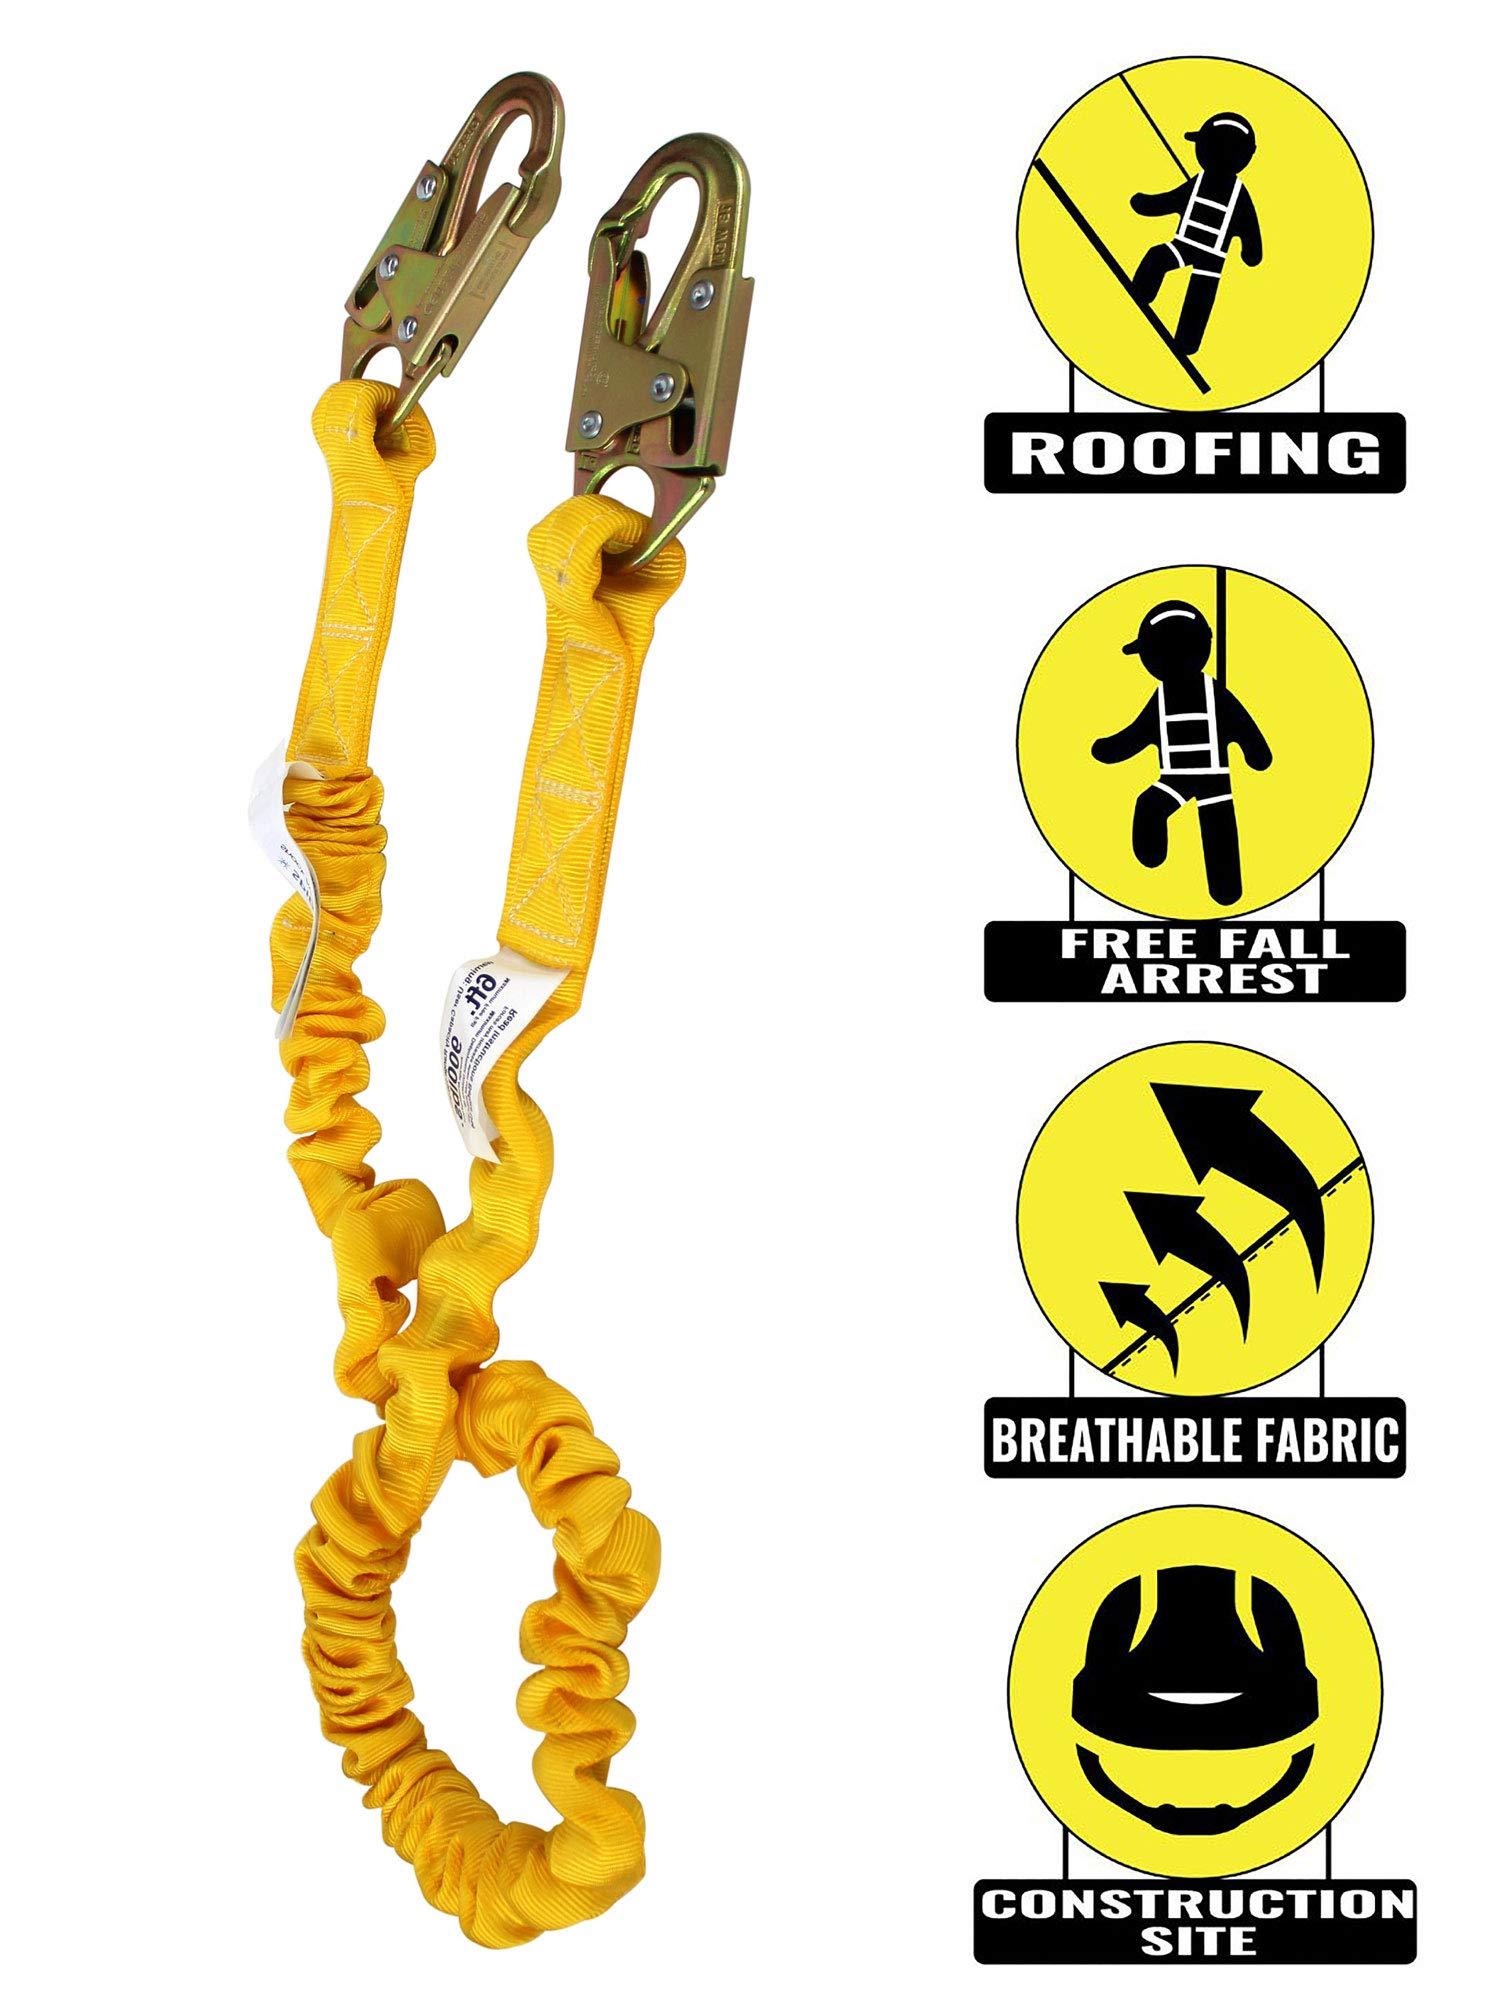 SPL-S102 Yellow Elasticated Internal Shock Absorbing Lanyard w/Two Steel Forged Snap Hook (N-3610) [1 pack]